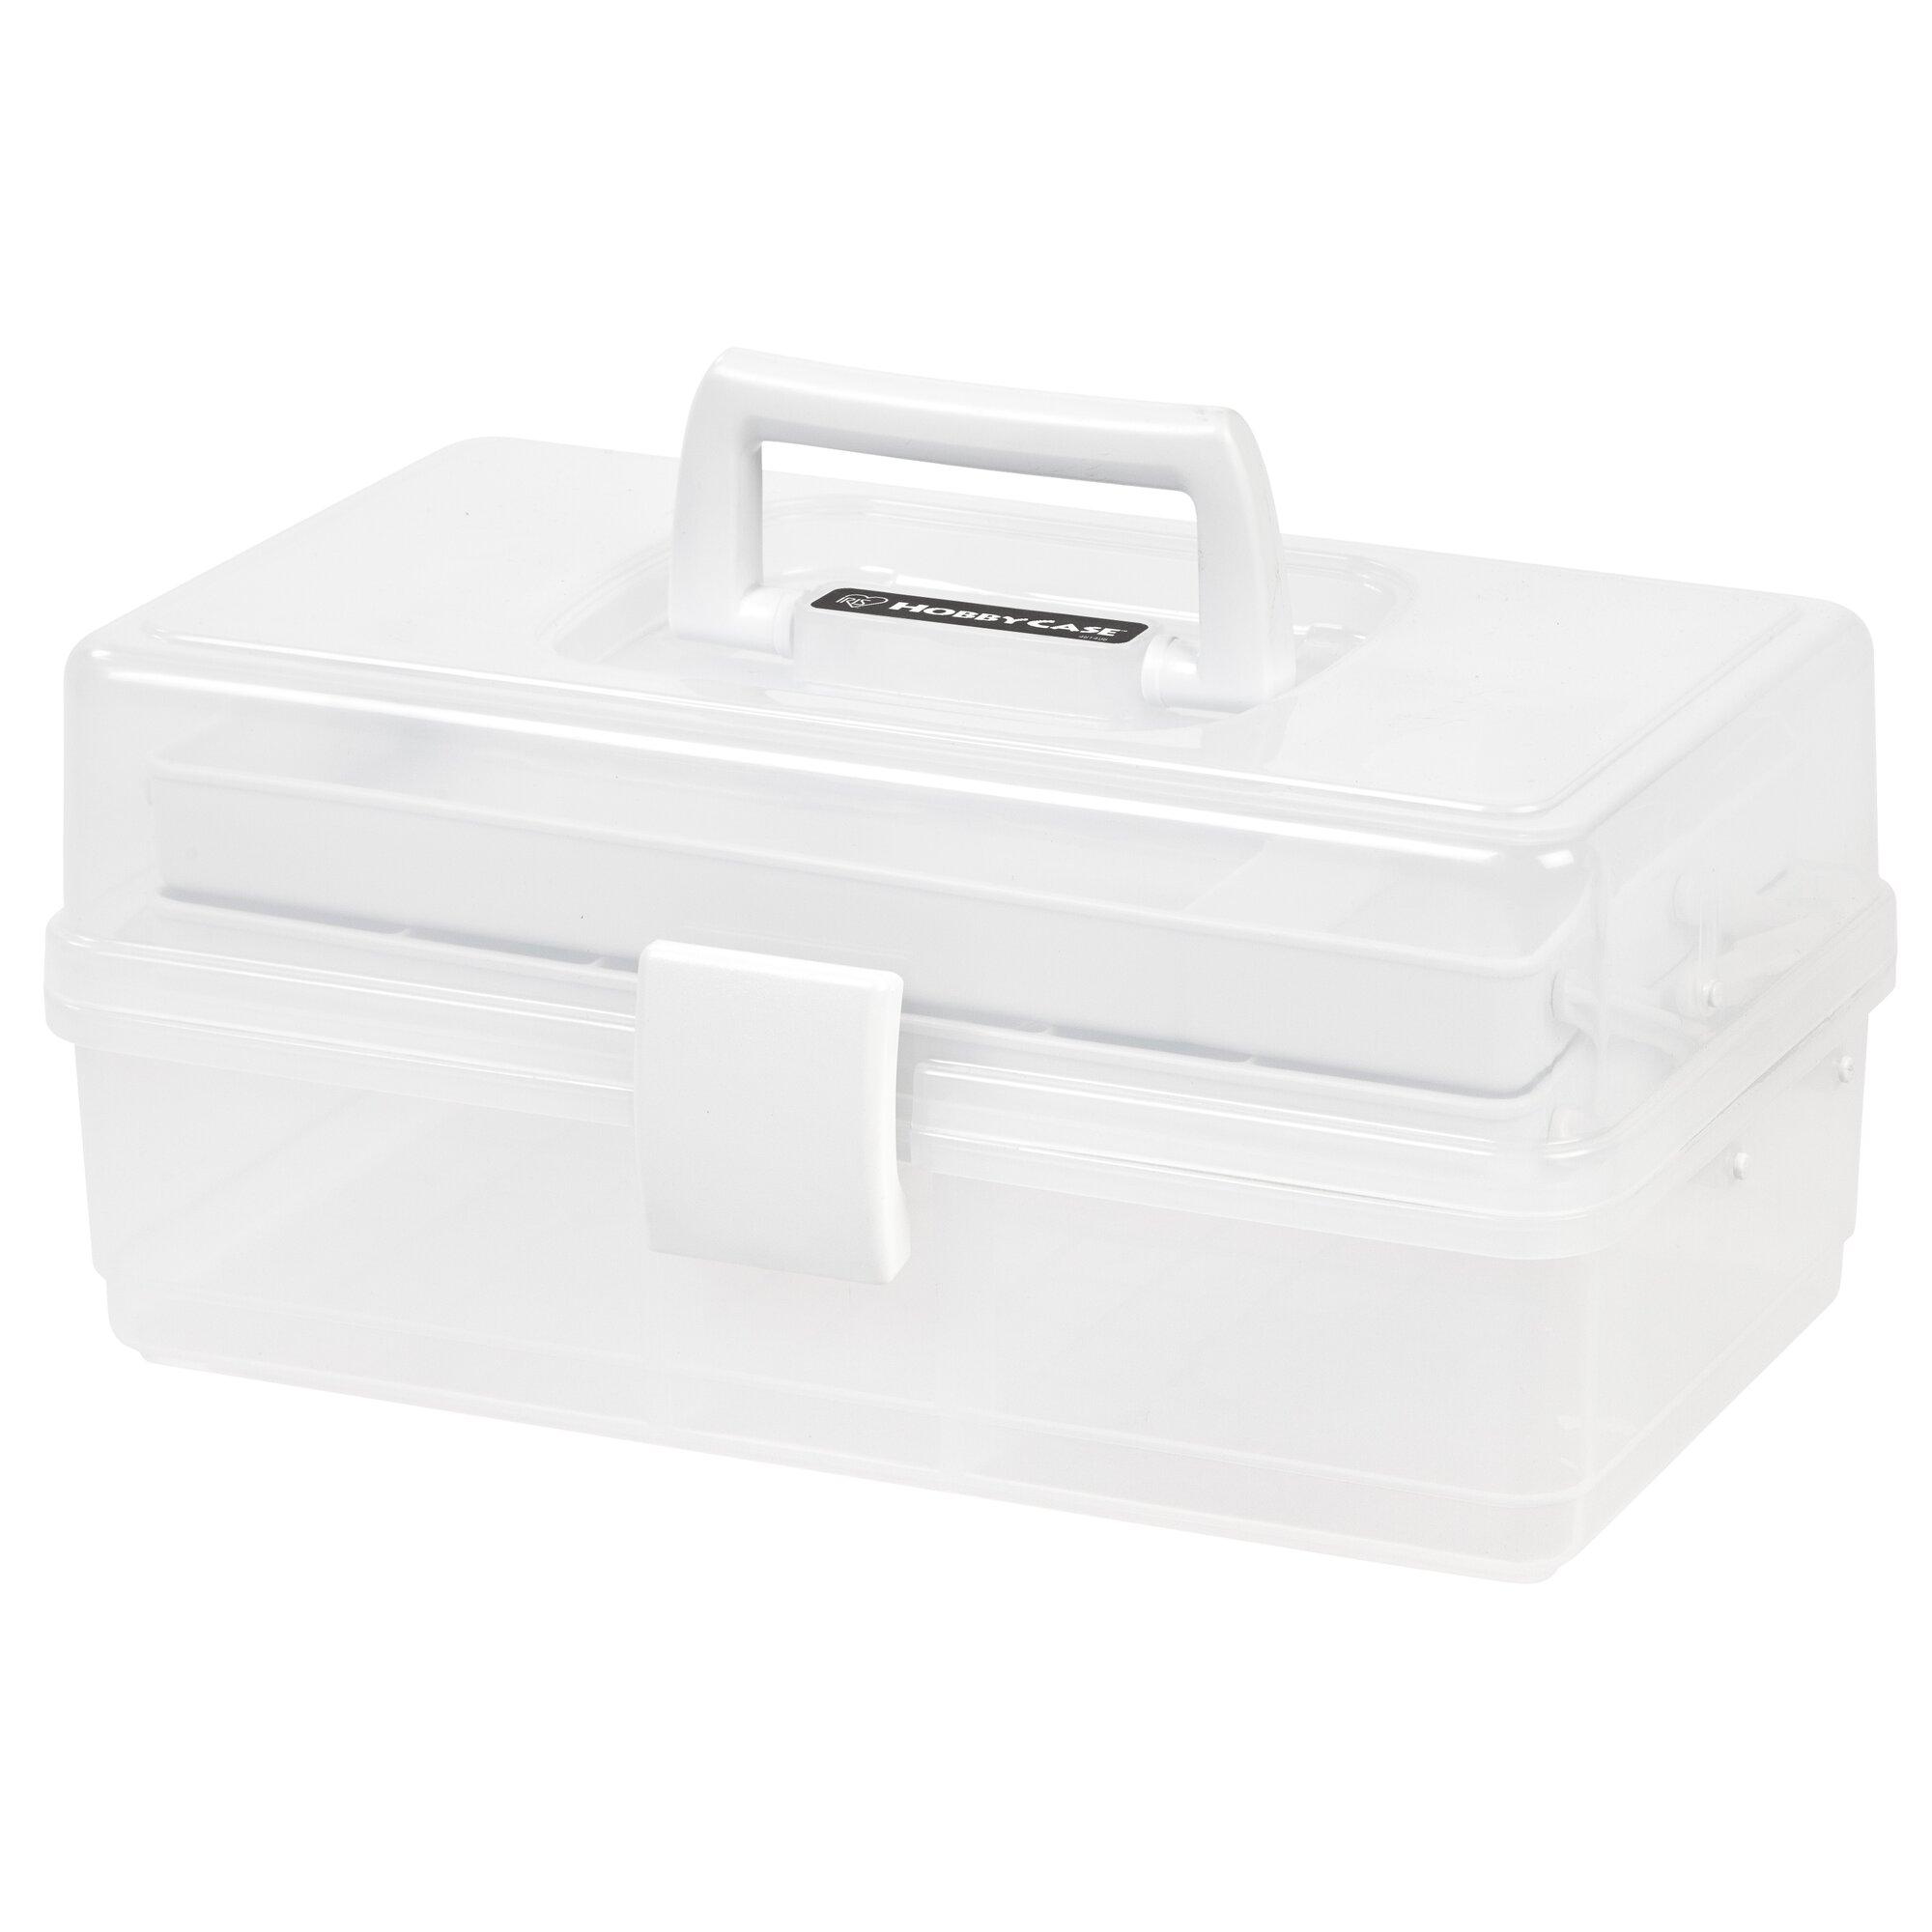 Plastic craft storage boxes - Hobby Craft Storage Case